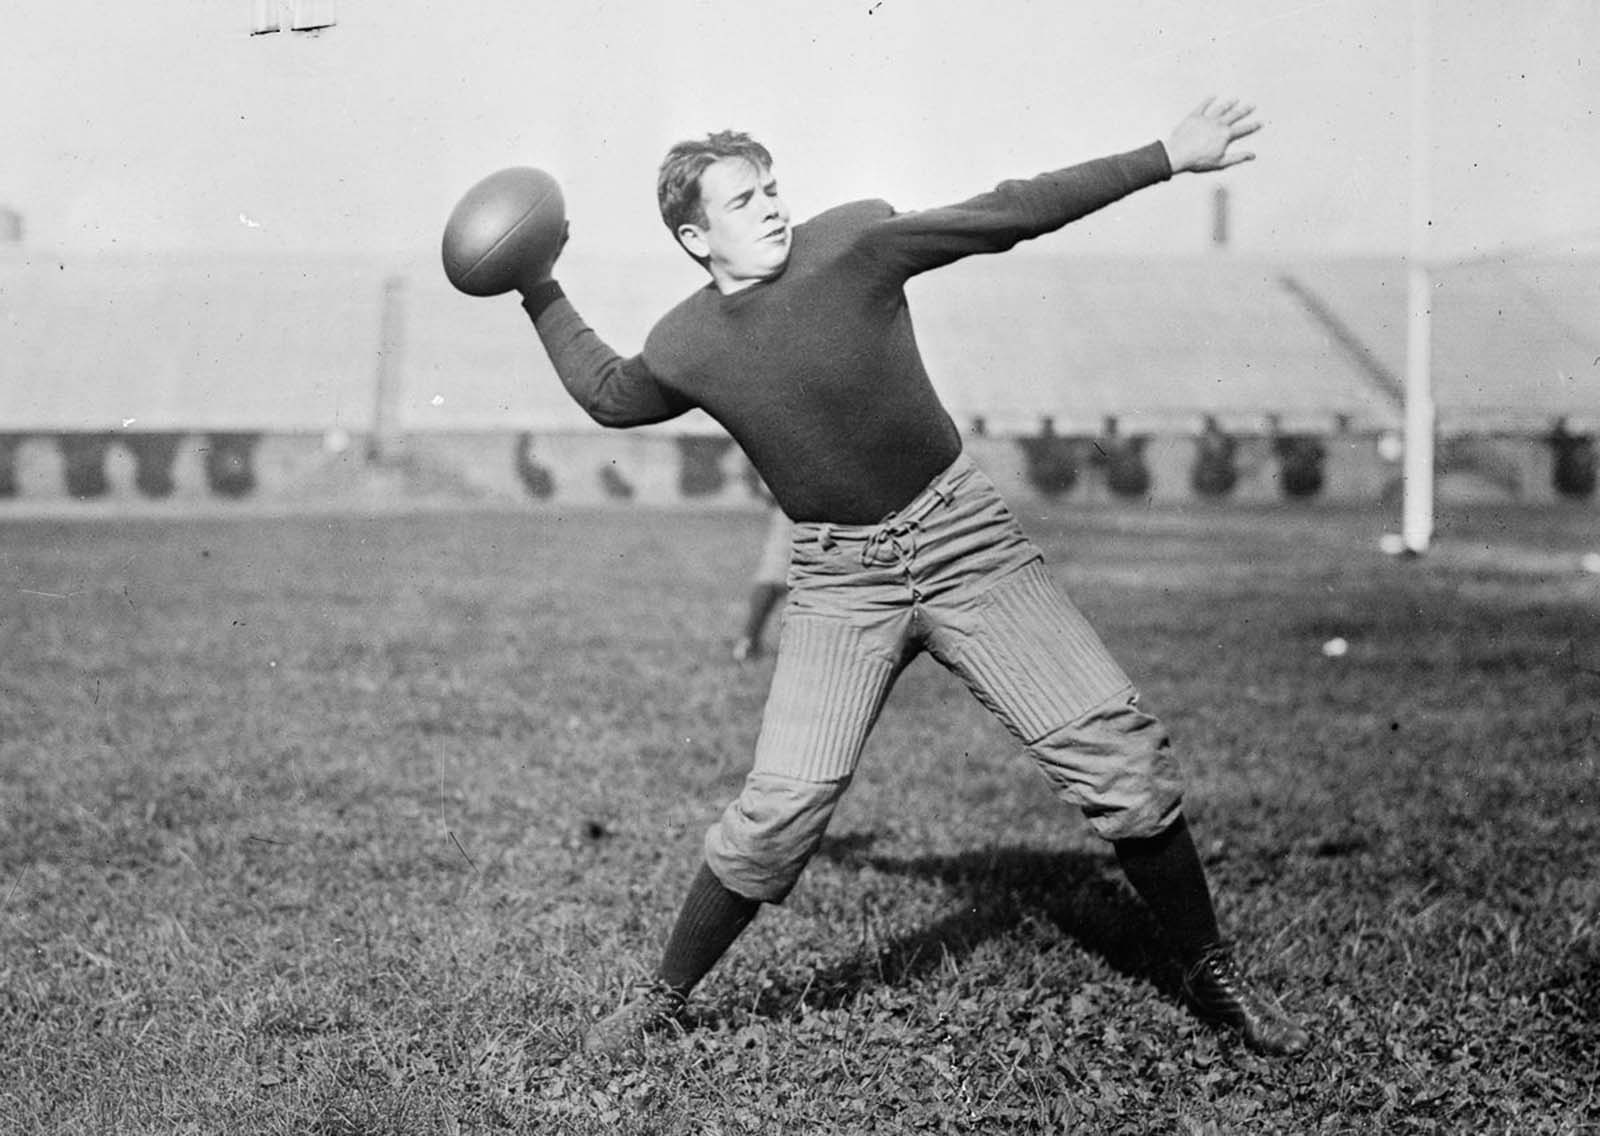 A player for Pennsylvania University. 1910.